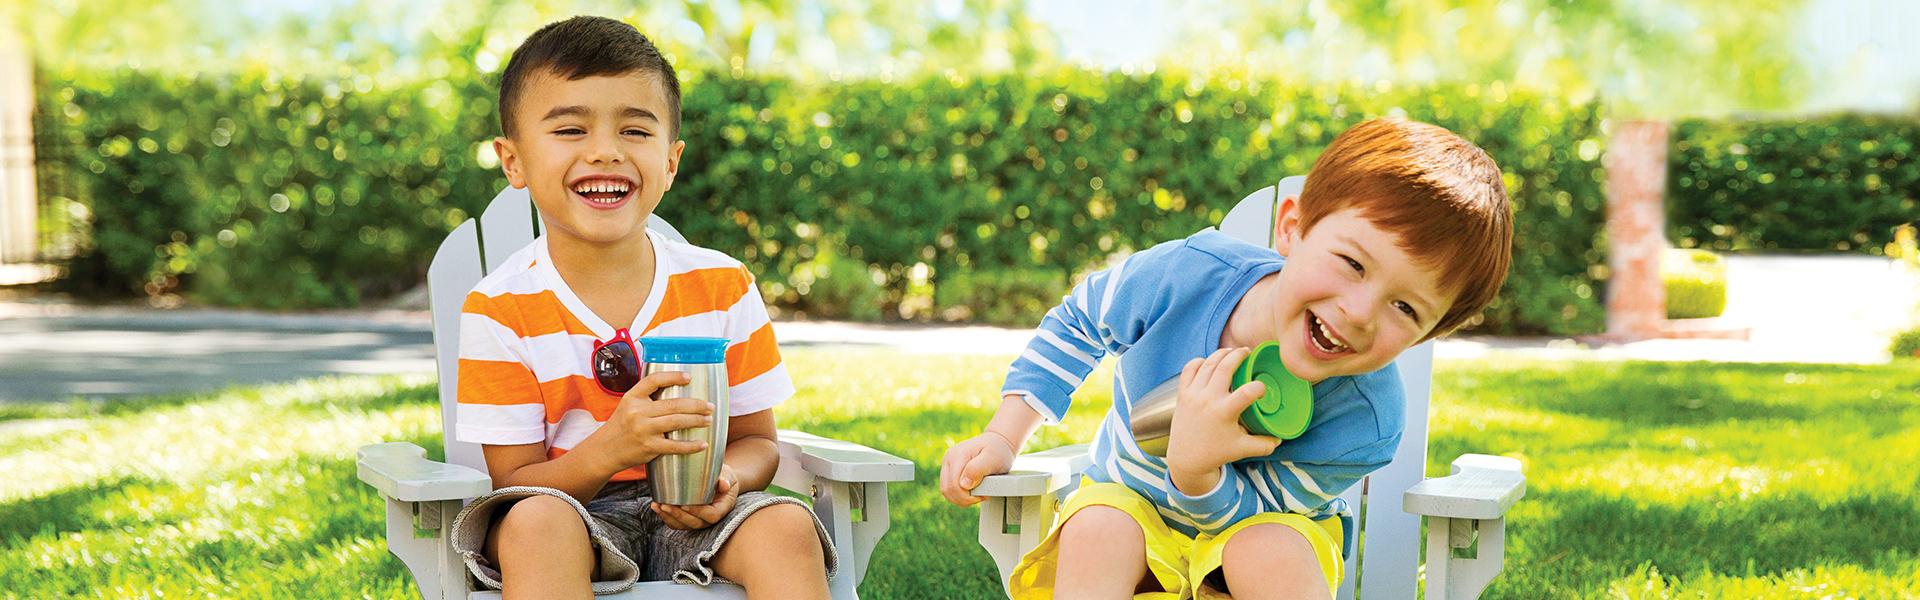 munchkin productos de alimentacion para bebés